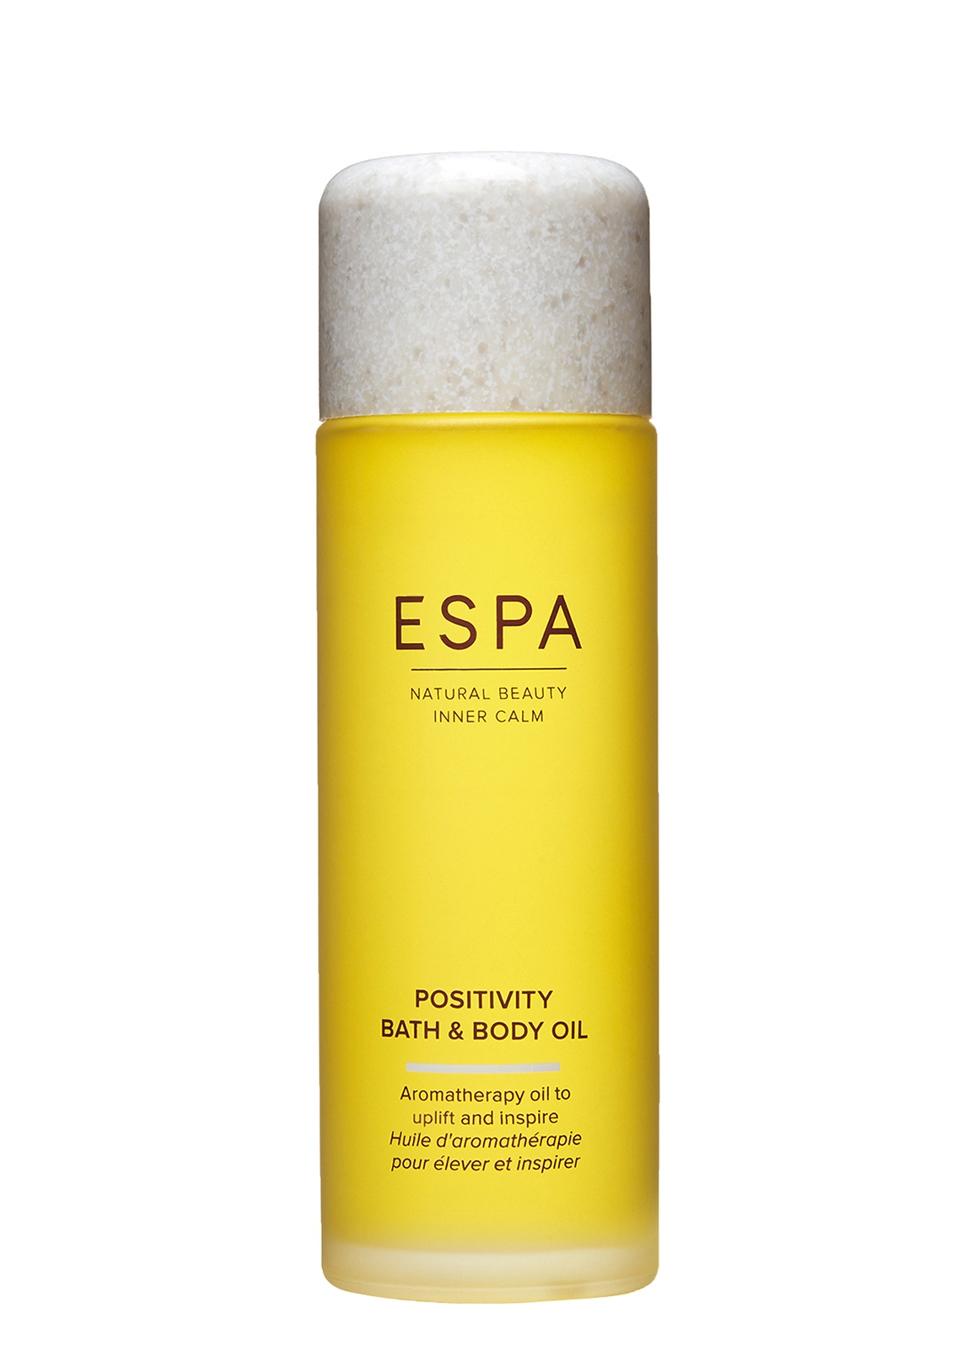 Positivity Bath & Body Oil